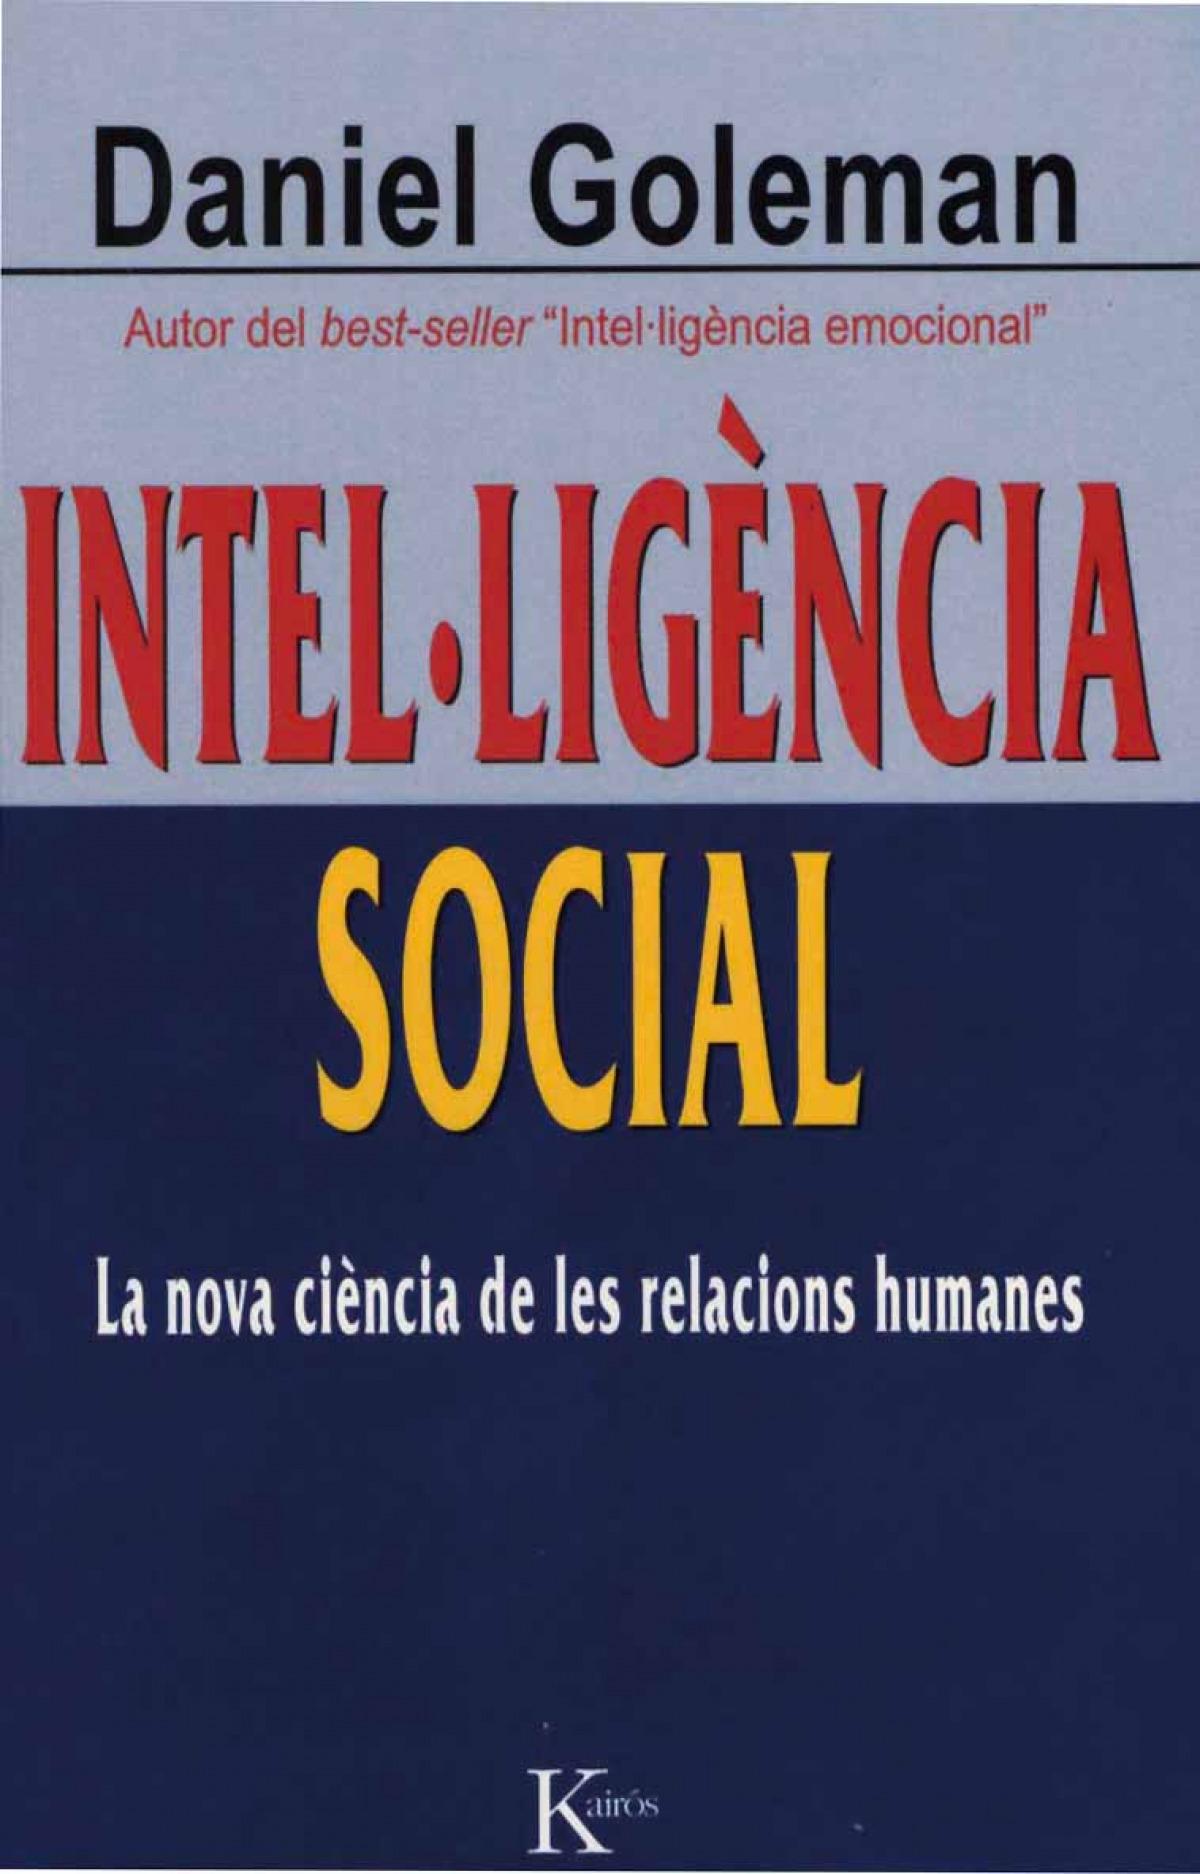 Intel·ligència social